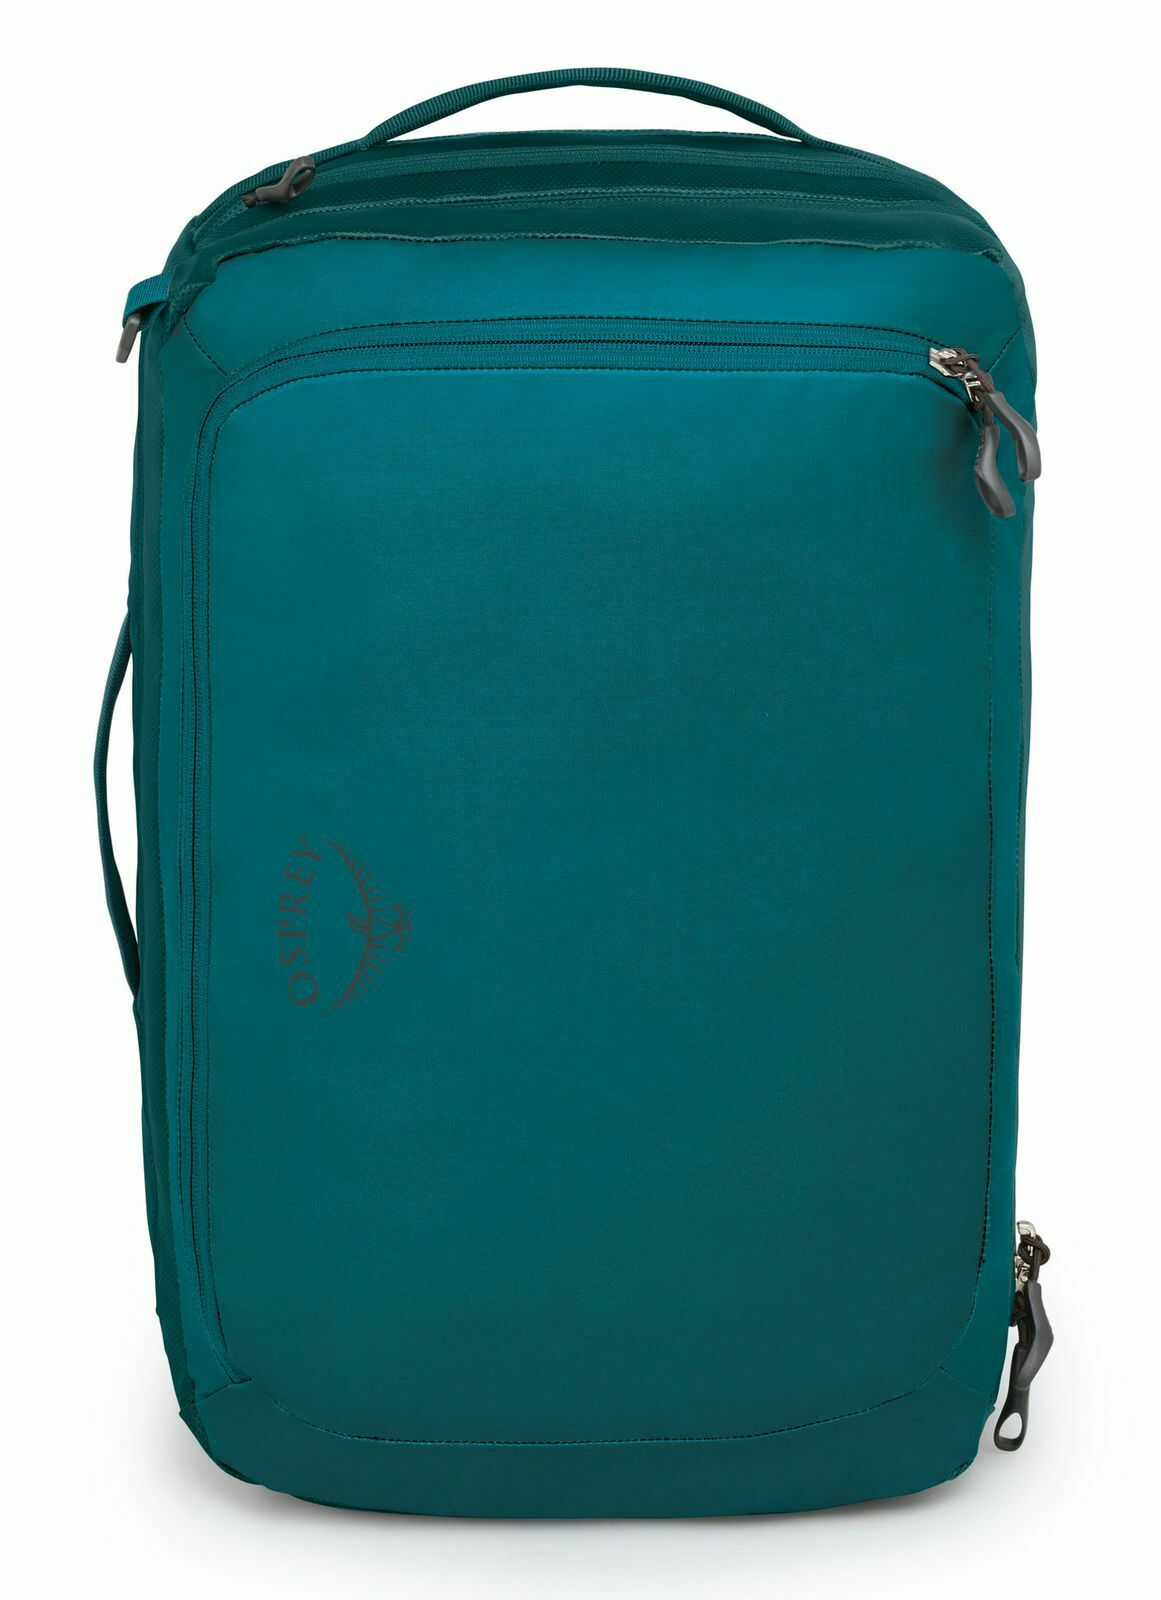 Osprey sac de voyage Transporter Global autoryOn 38